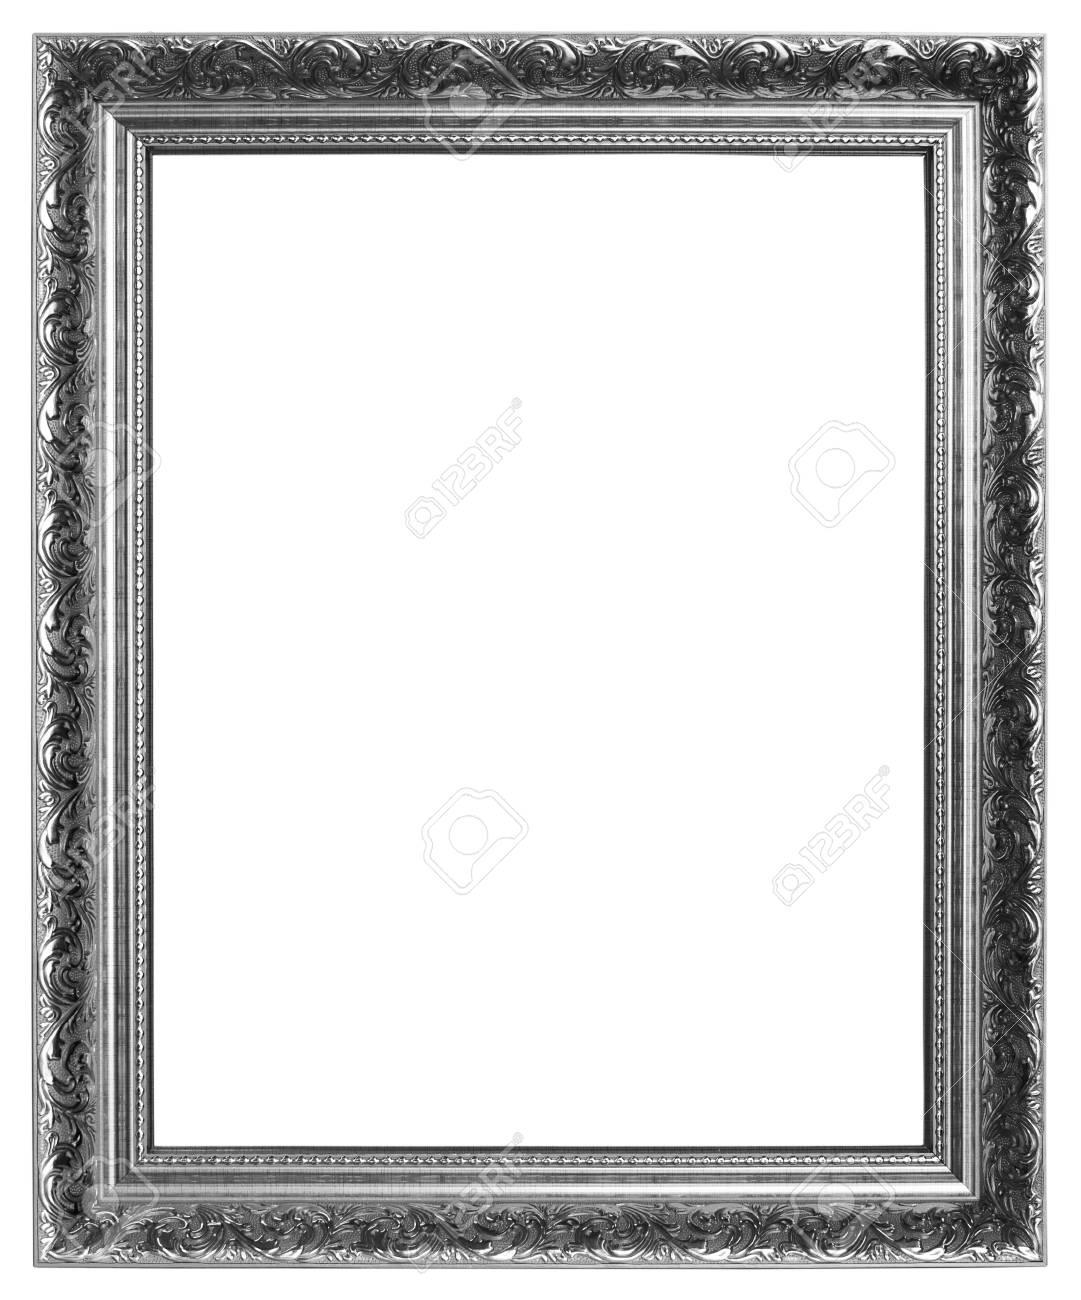 Silver frame on white background - 20670892